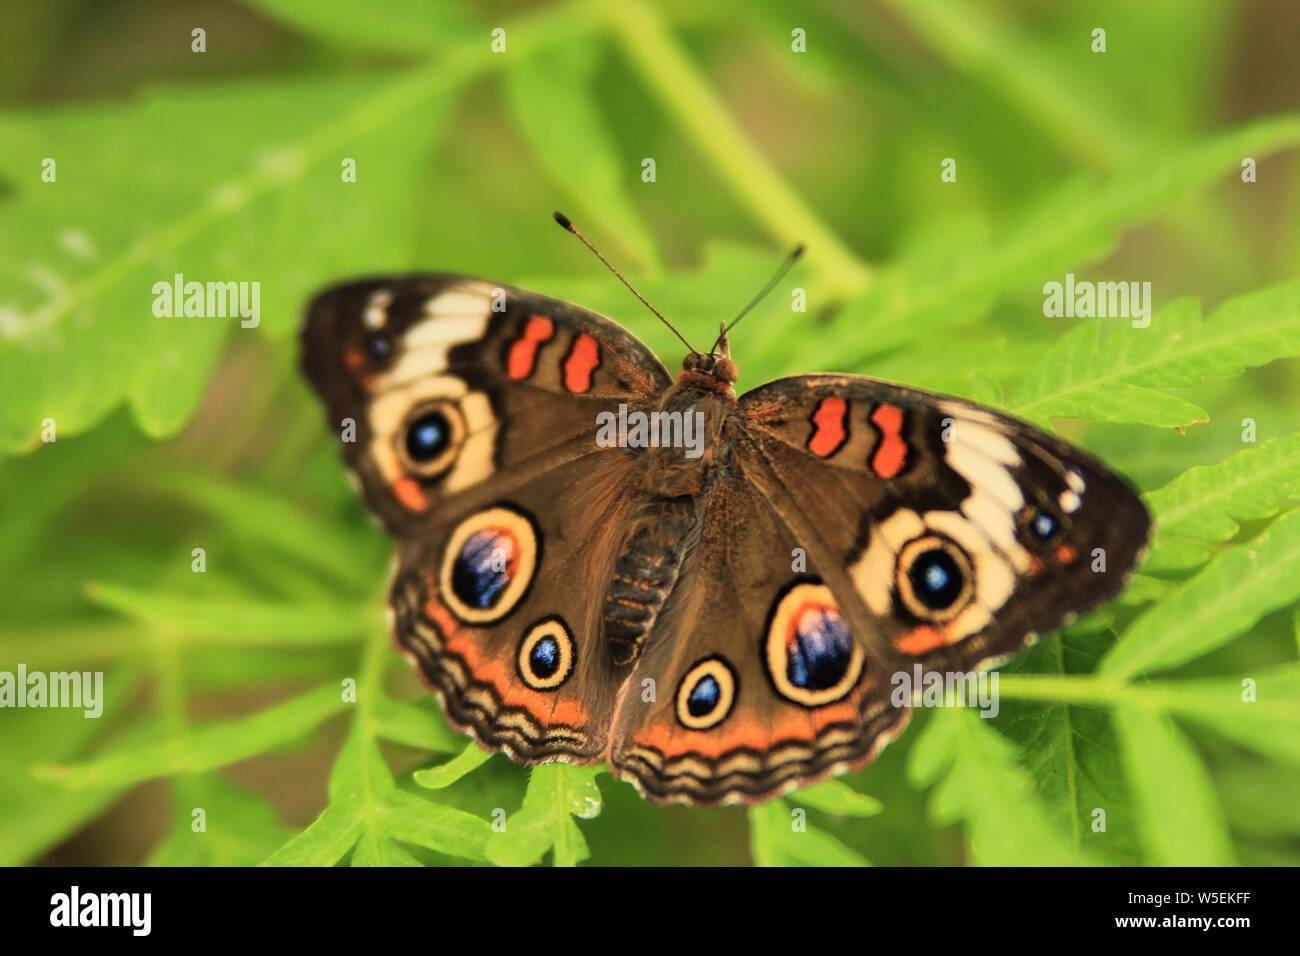 Junonia coenia - Common Buckeye butterfly with open wings Stock Photo